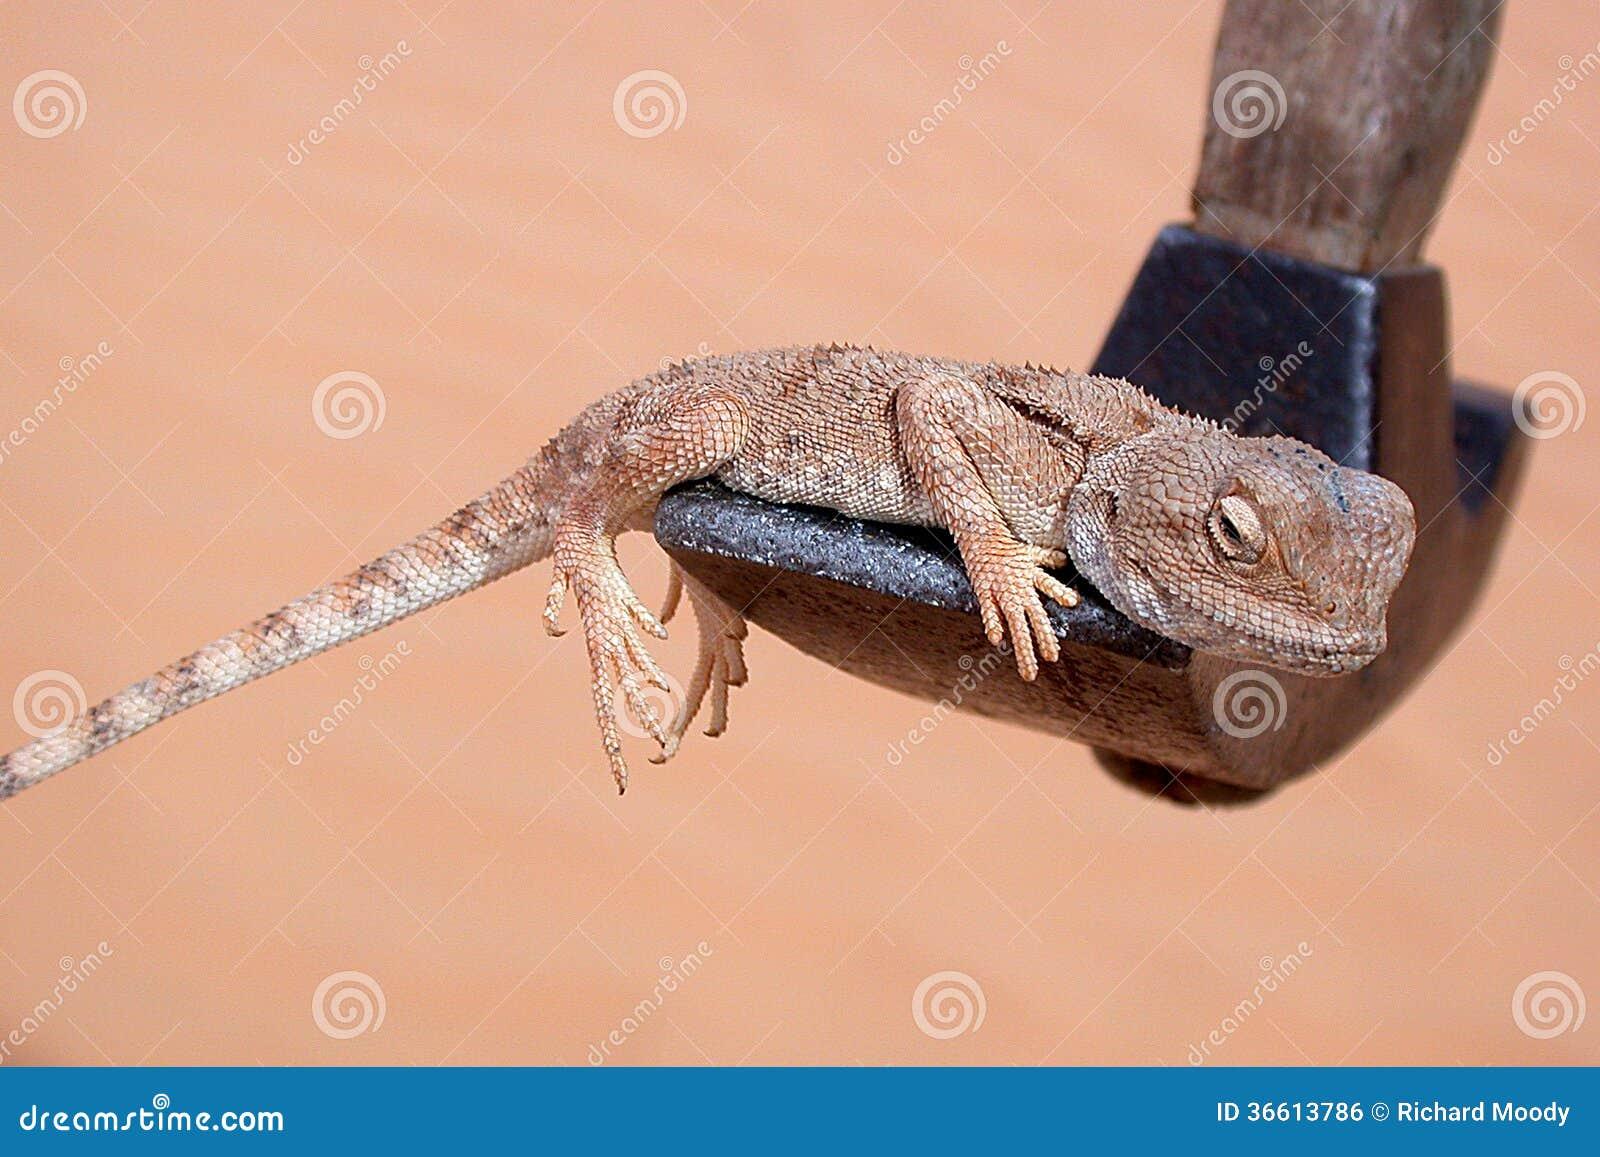 Lizard on Hammer